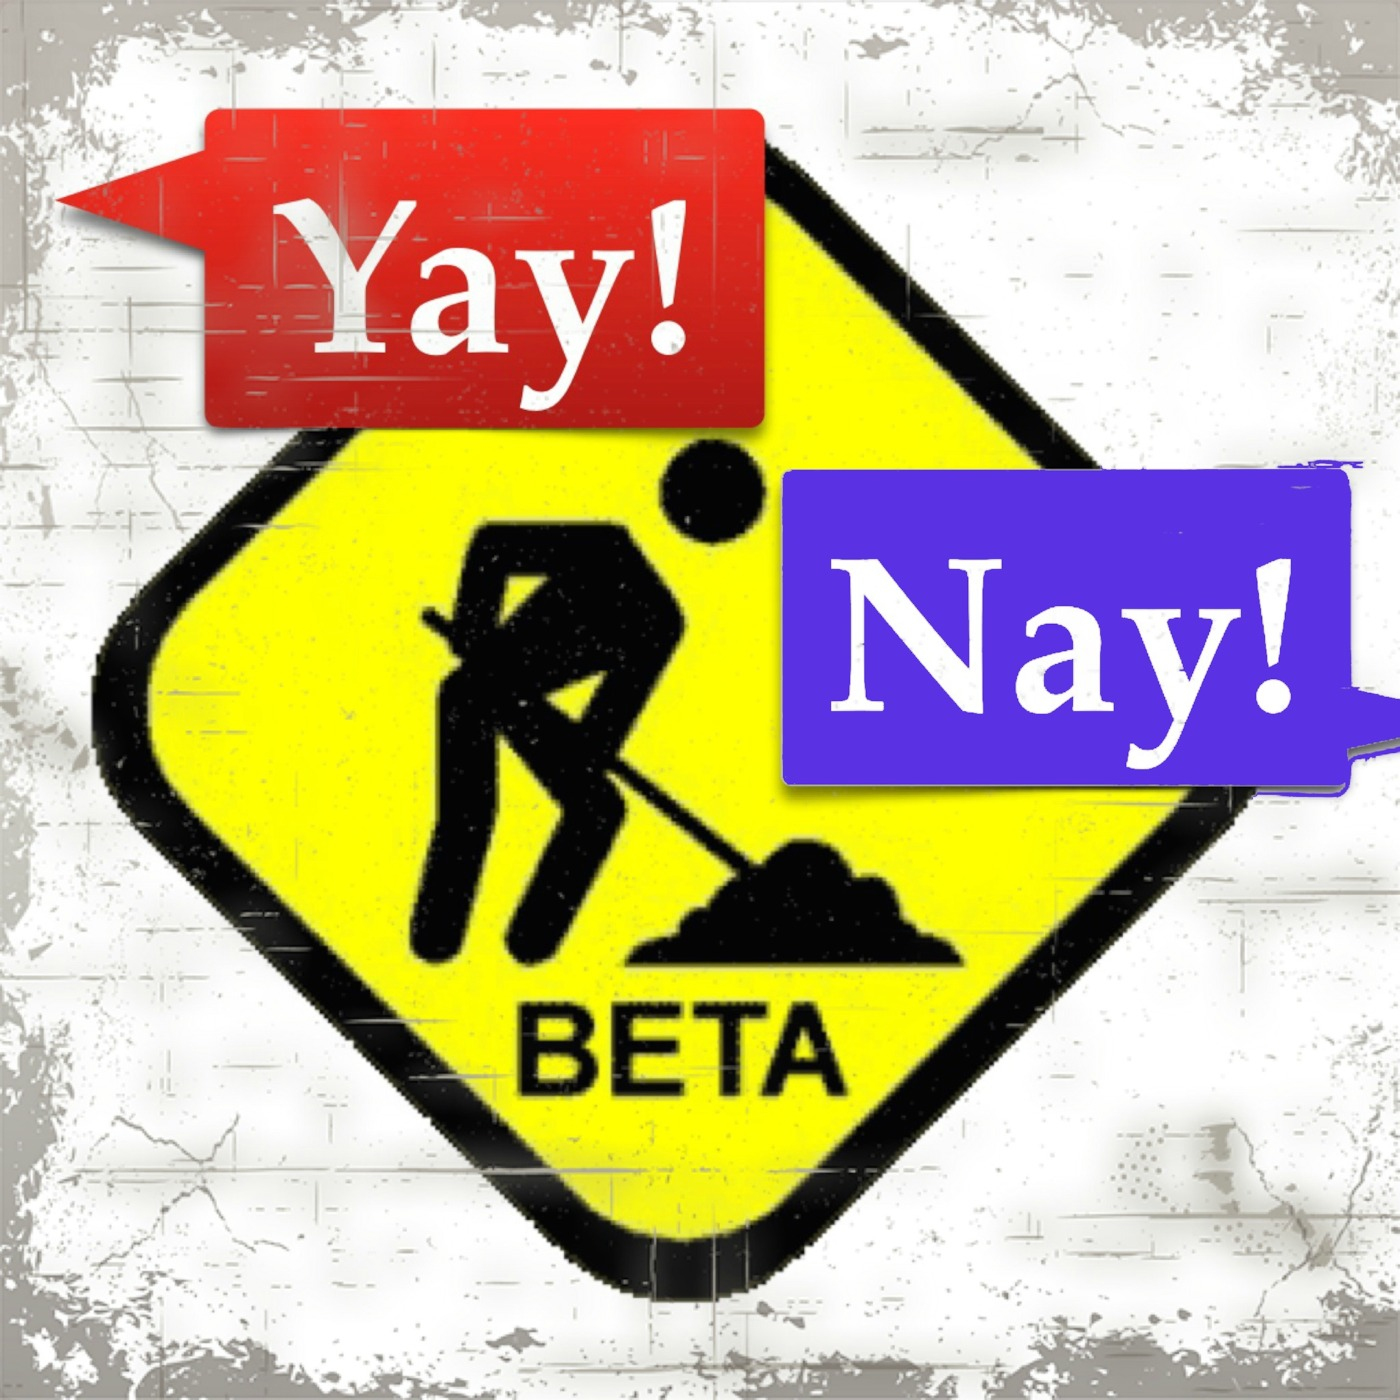 Yay-Nay